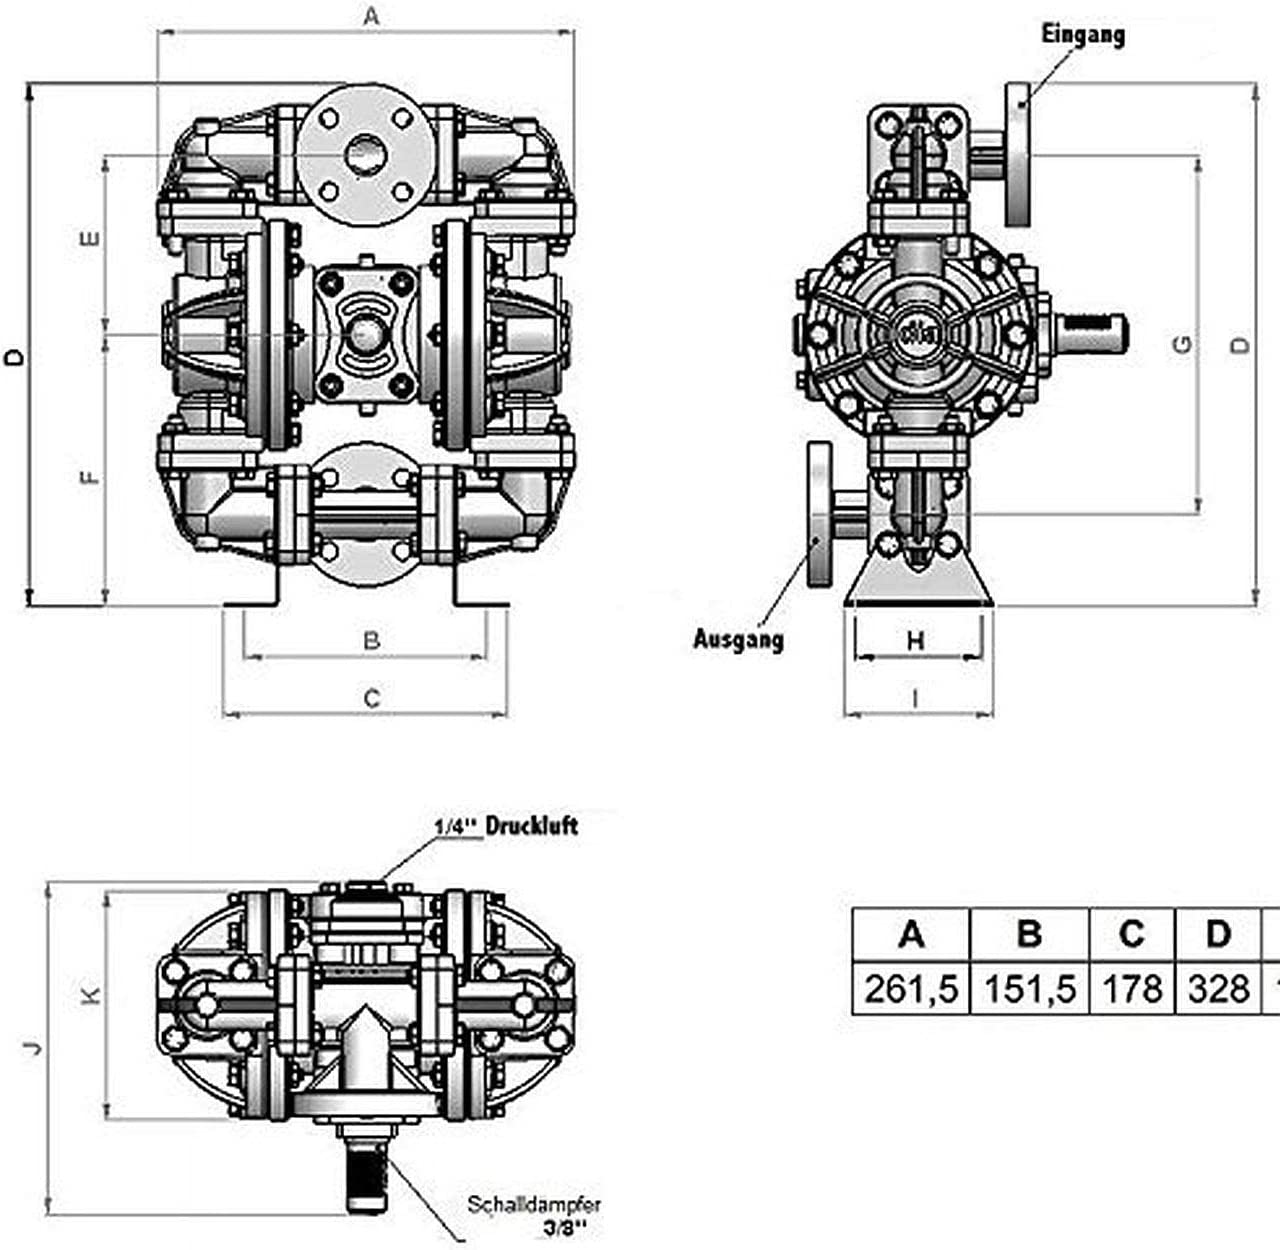 Fasspumpe, HP05 Druckluft Doppelmembranpumpe 55liter//min Doppel-Membranpumpe Druckluftmembranpumpe